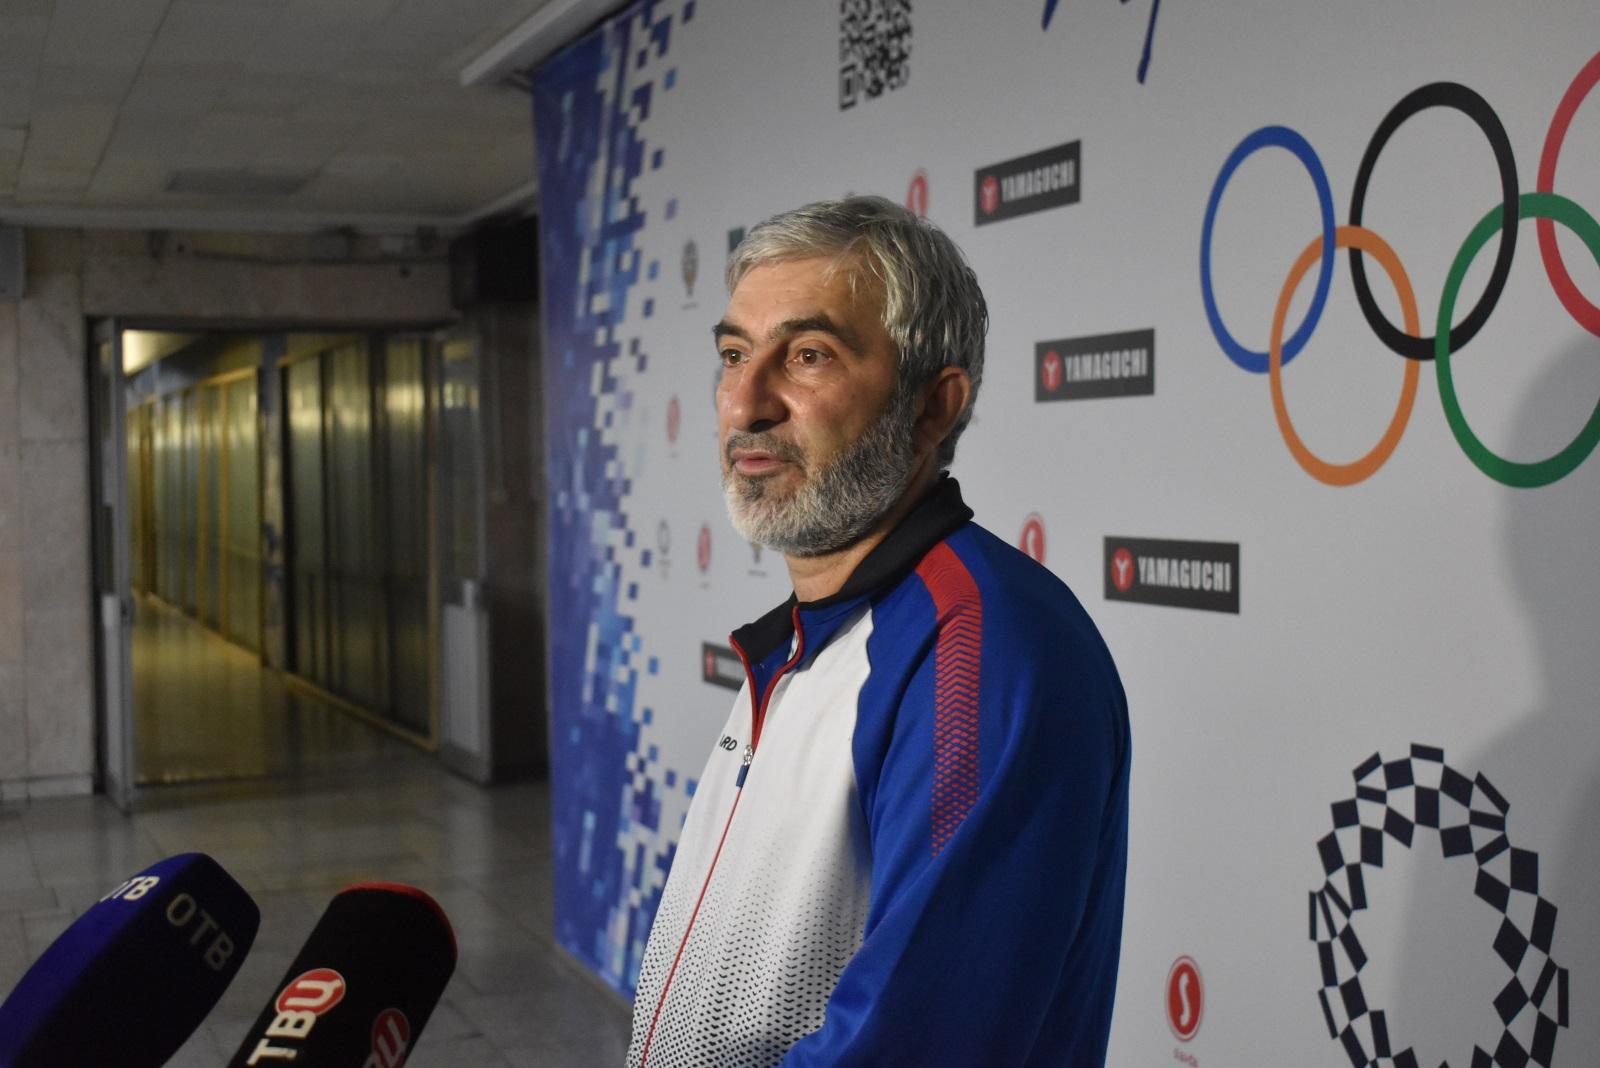 ларин токио олимпиада золото 2020 паратхэквондо тхэквондо larin tokyo 2020 paralympics паралимпиада